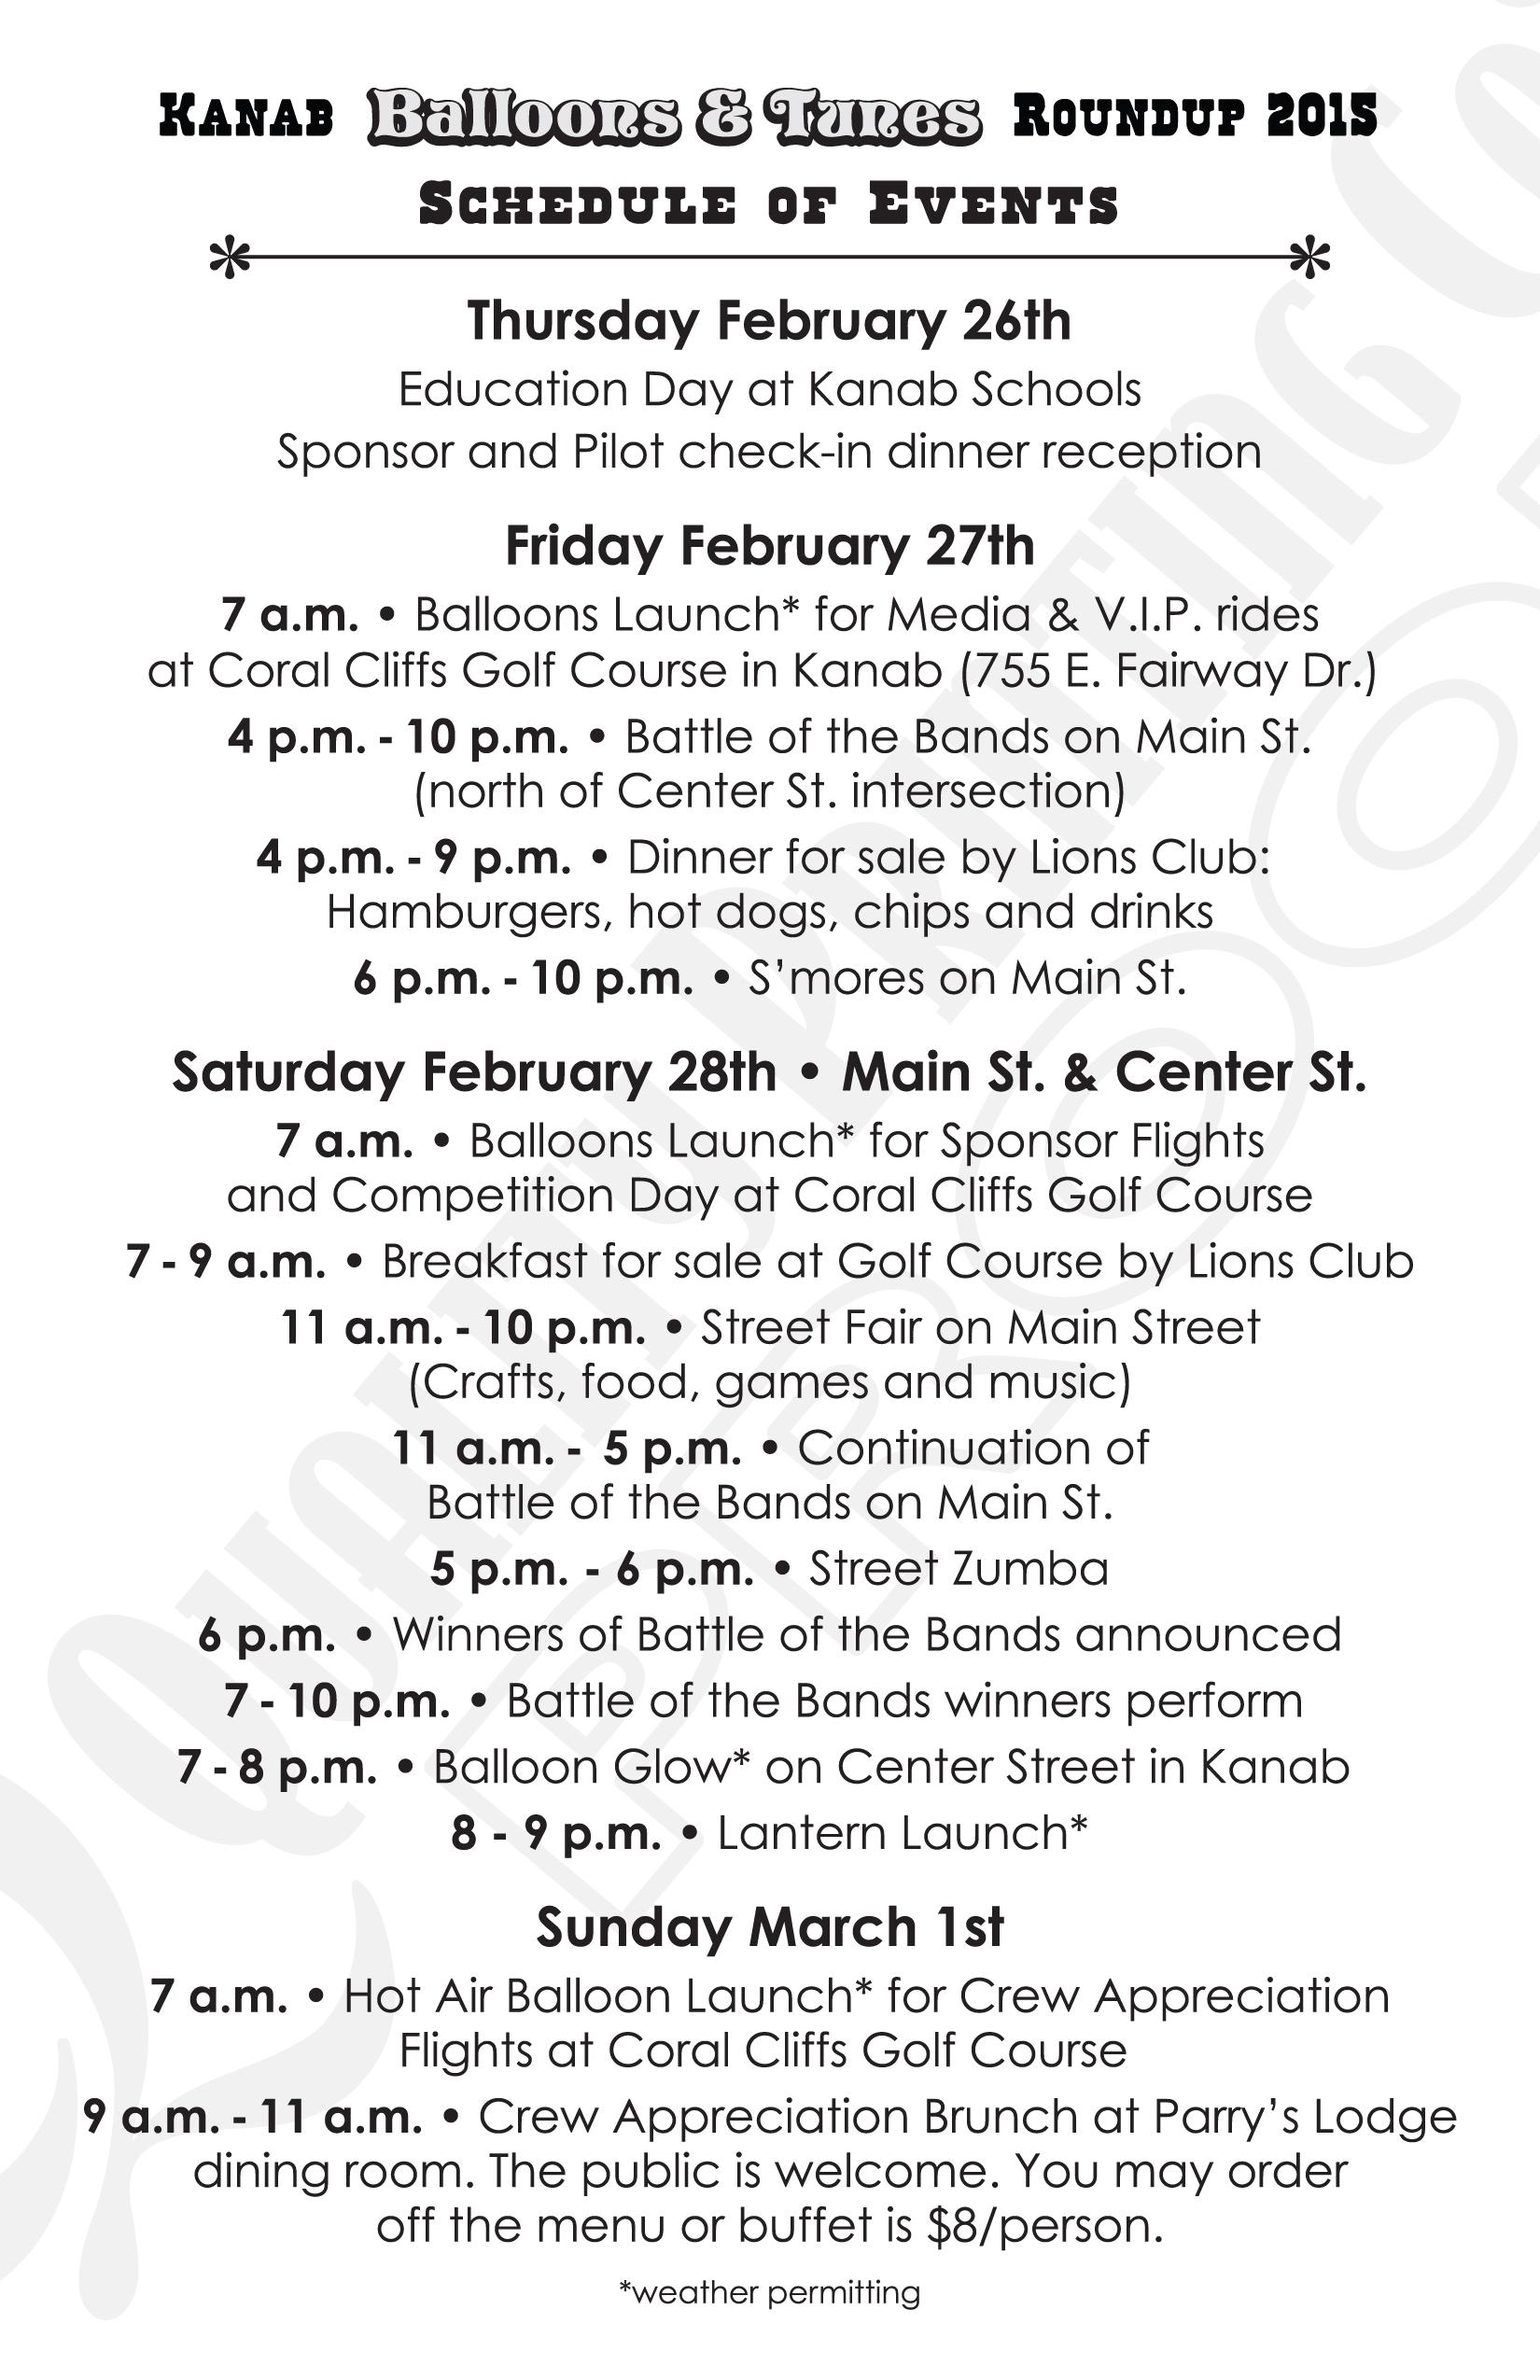 Schedule of events for Kanab Balloons & Tunes Roundup, Kanab, Utah, Feb. 27, 2015 | Image courtesy of Kanab Balloons & Tunes Roundup, St. George News